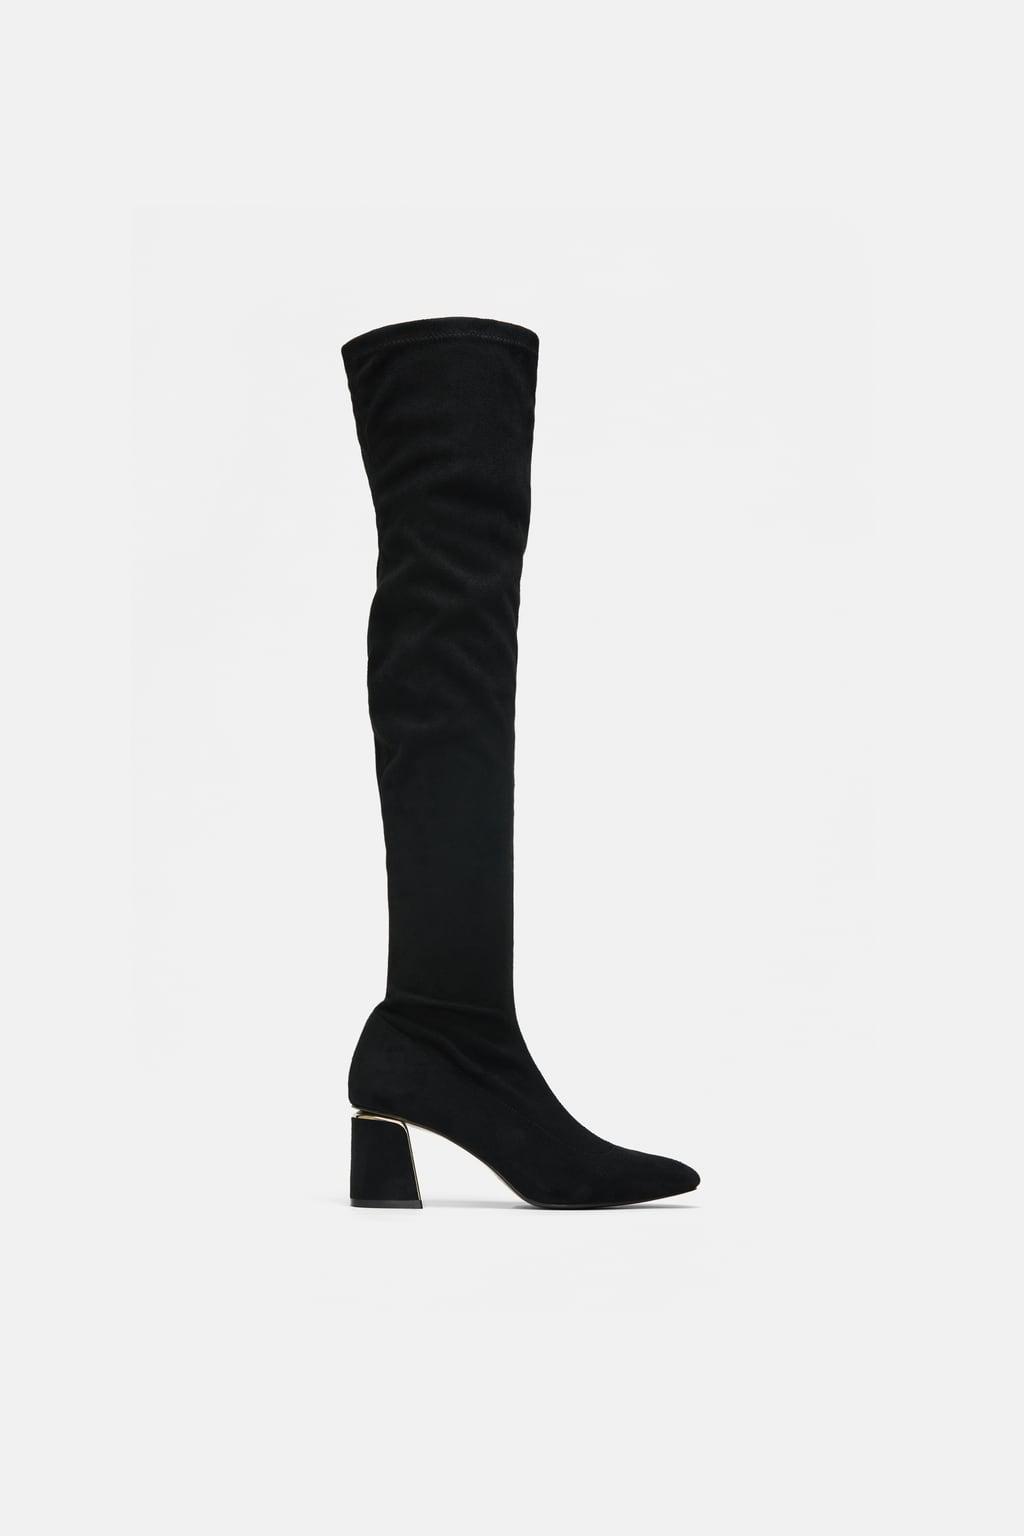 cec3f209d8d6 Zara Over-the-Knee Heeled Boots  89. We love the chunky heel ...